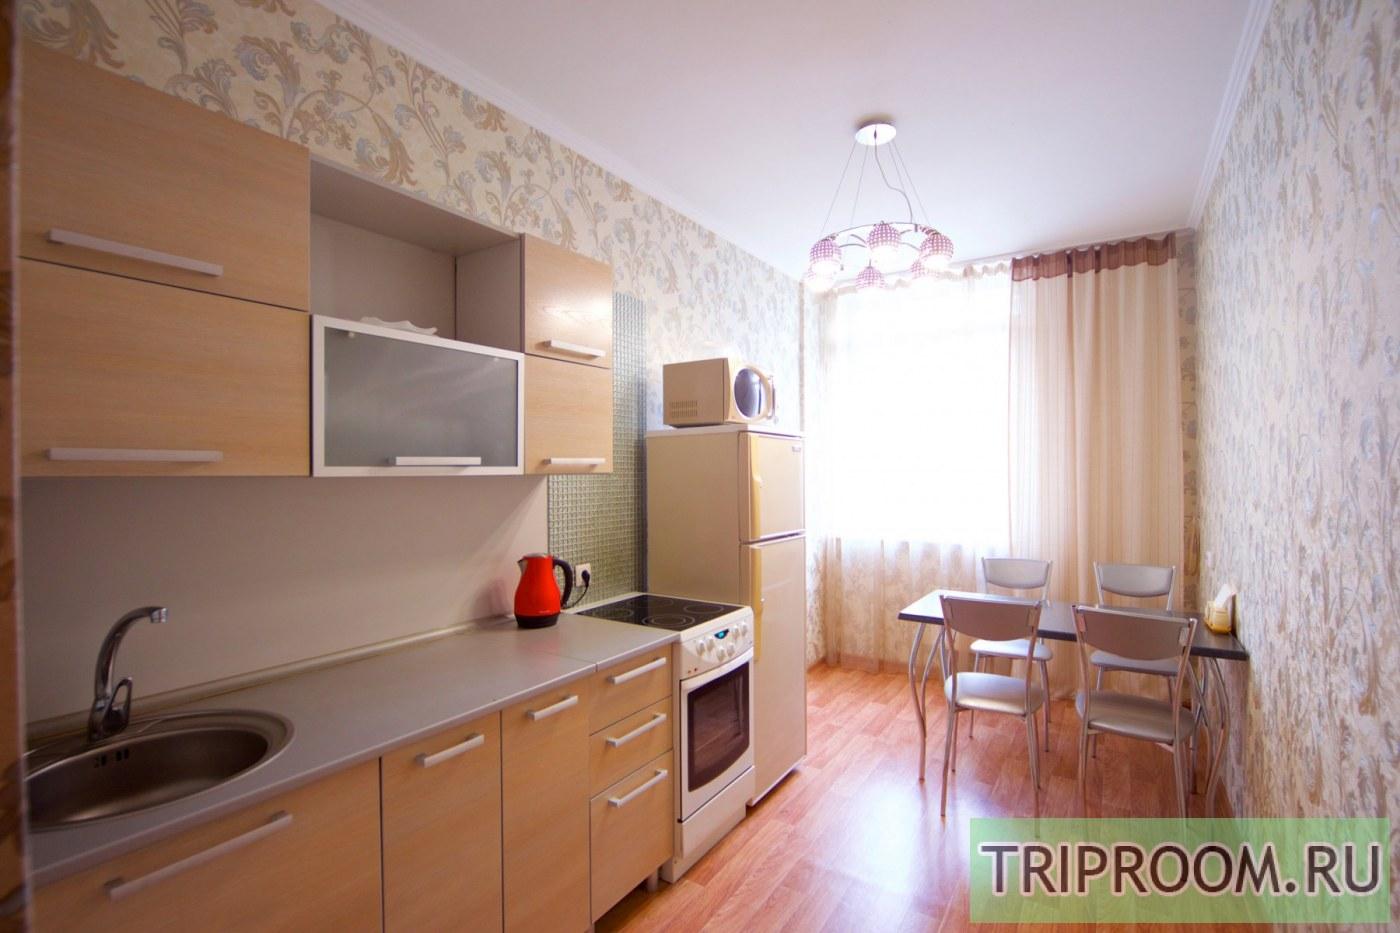 1-комнатная квартира посуточно (вариант № 40369), ул. Алексеева улица, фото № 5